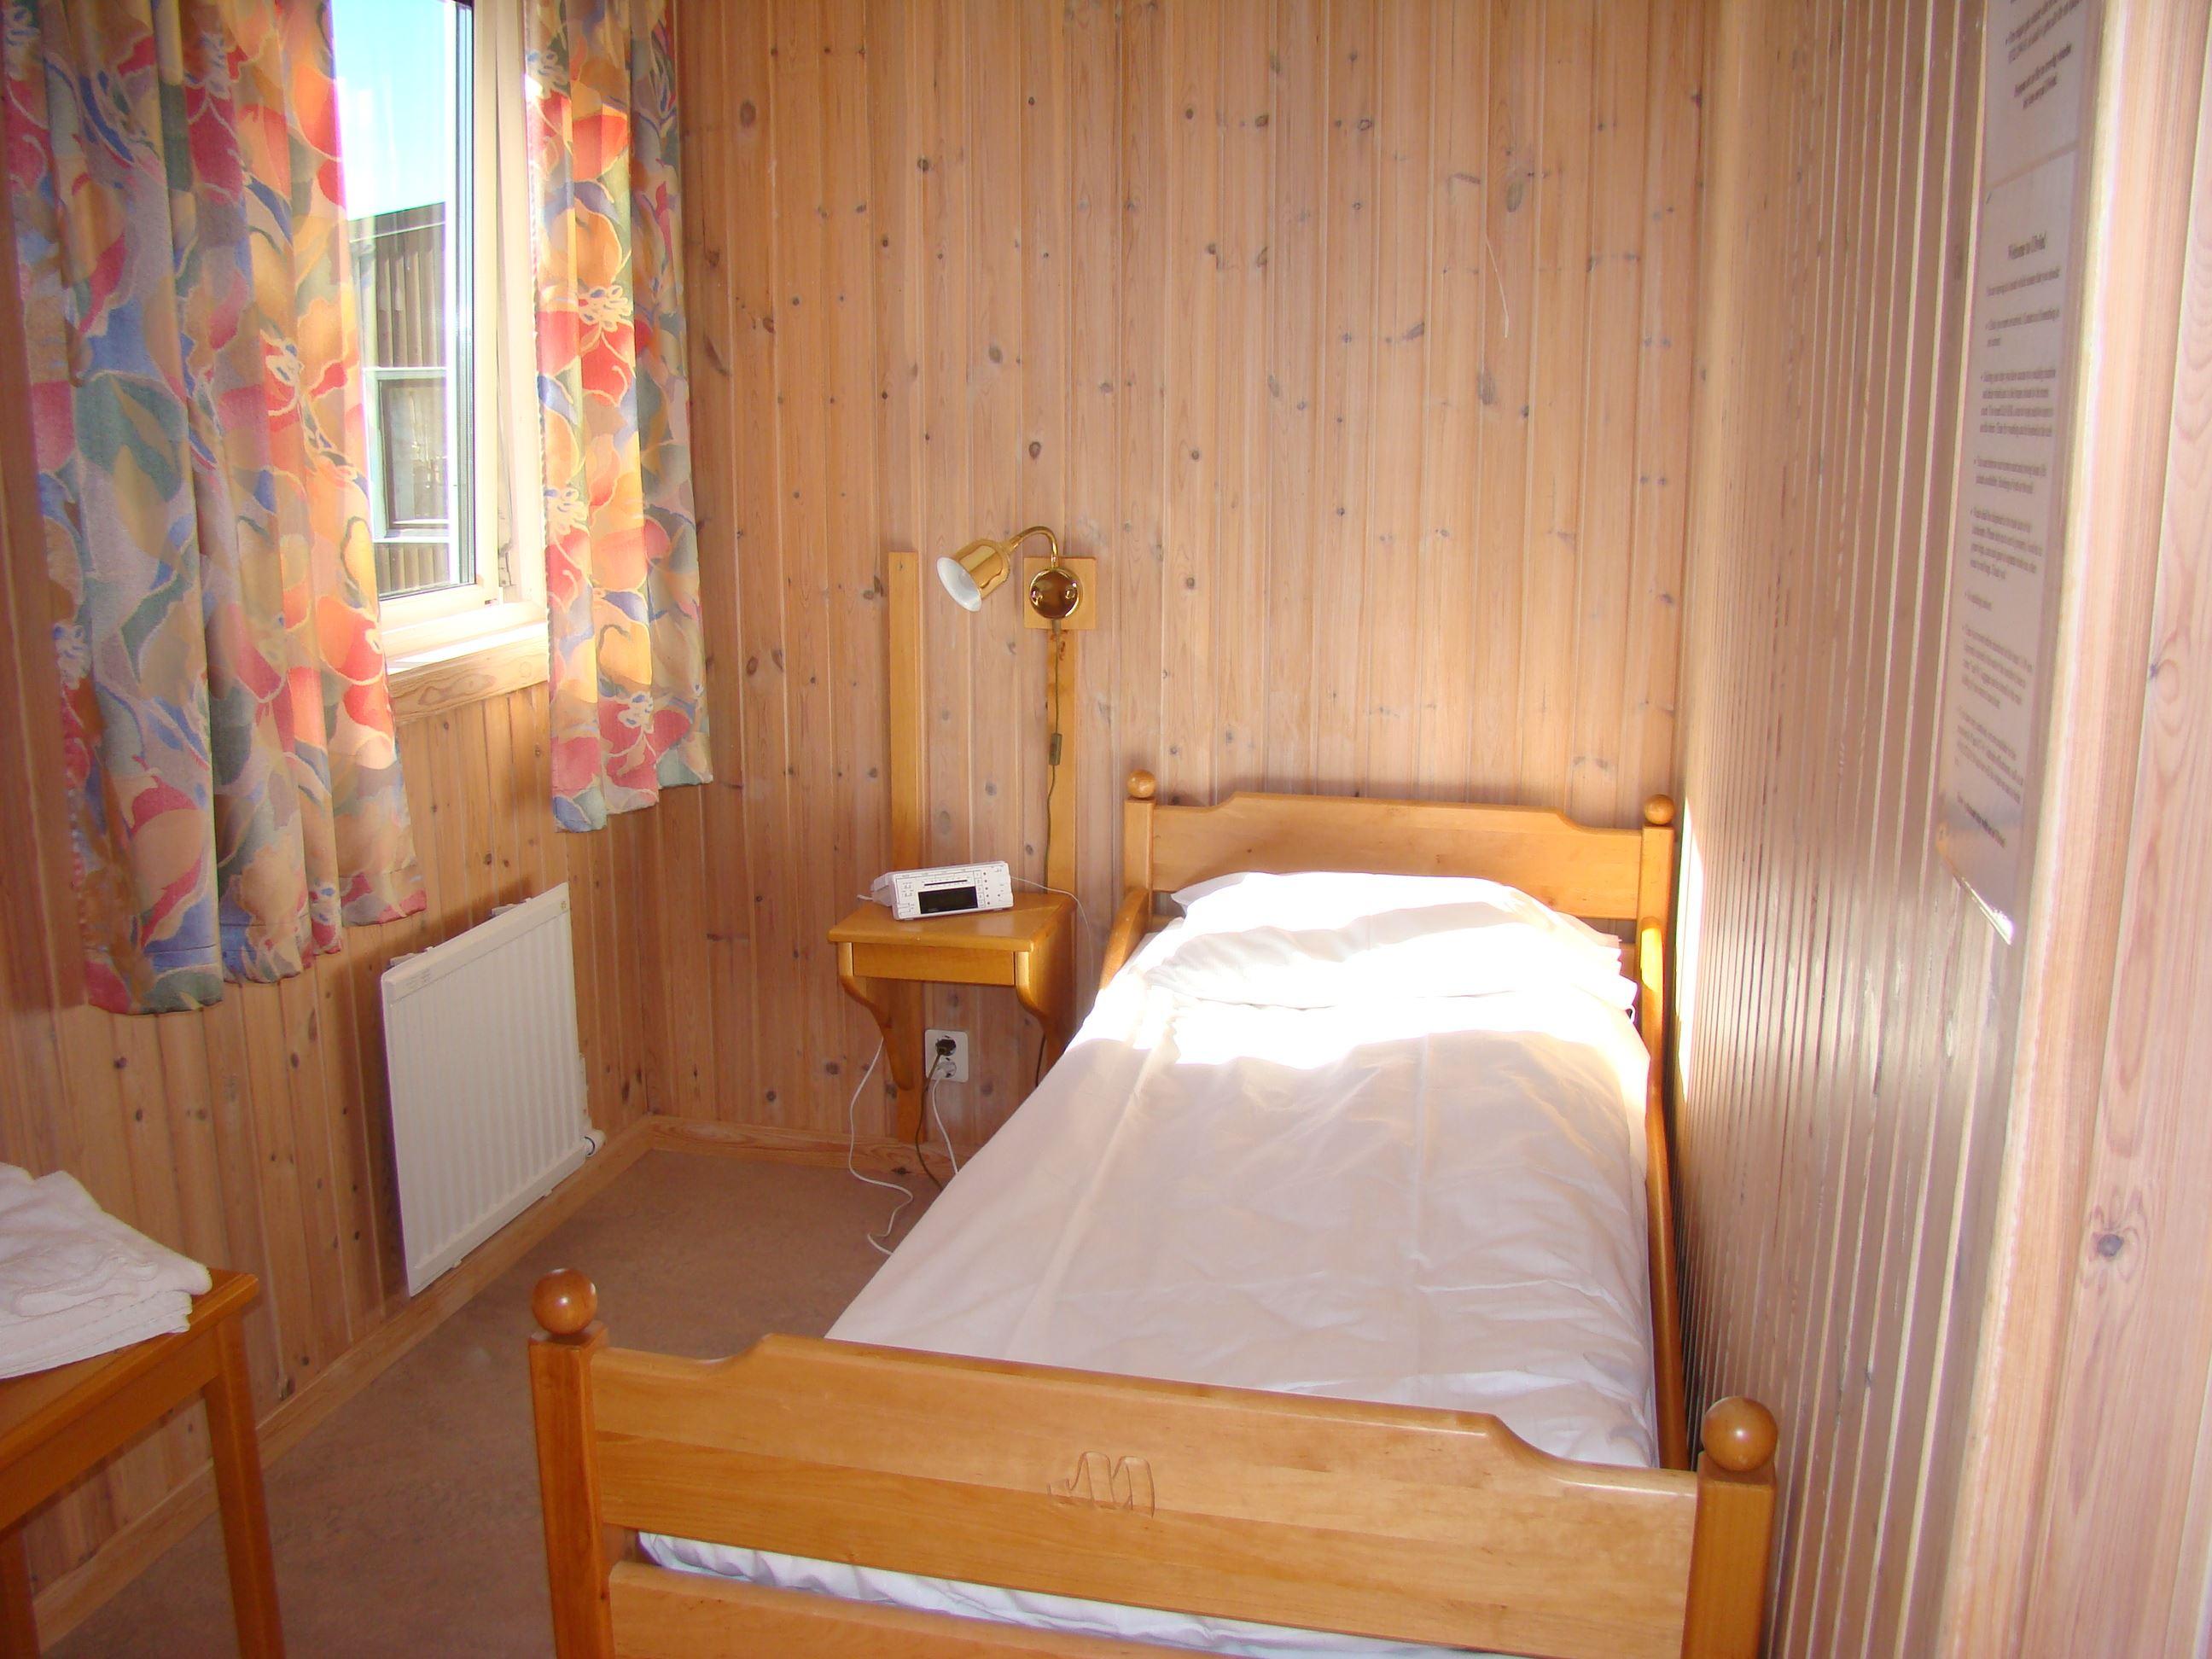 Ulvön SVIF Hostel in Ljungskile